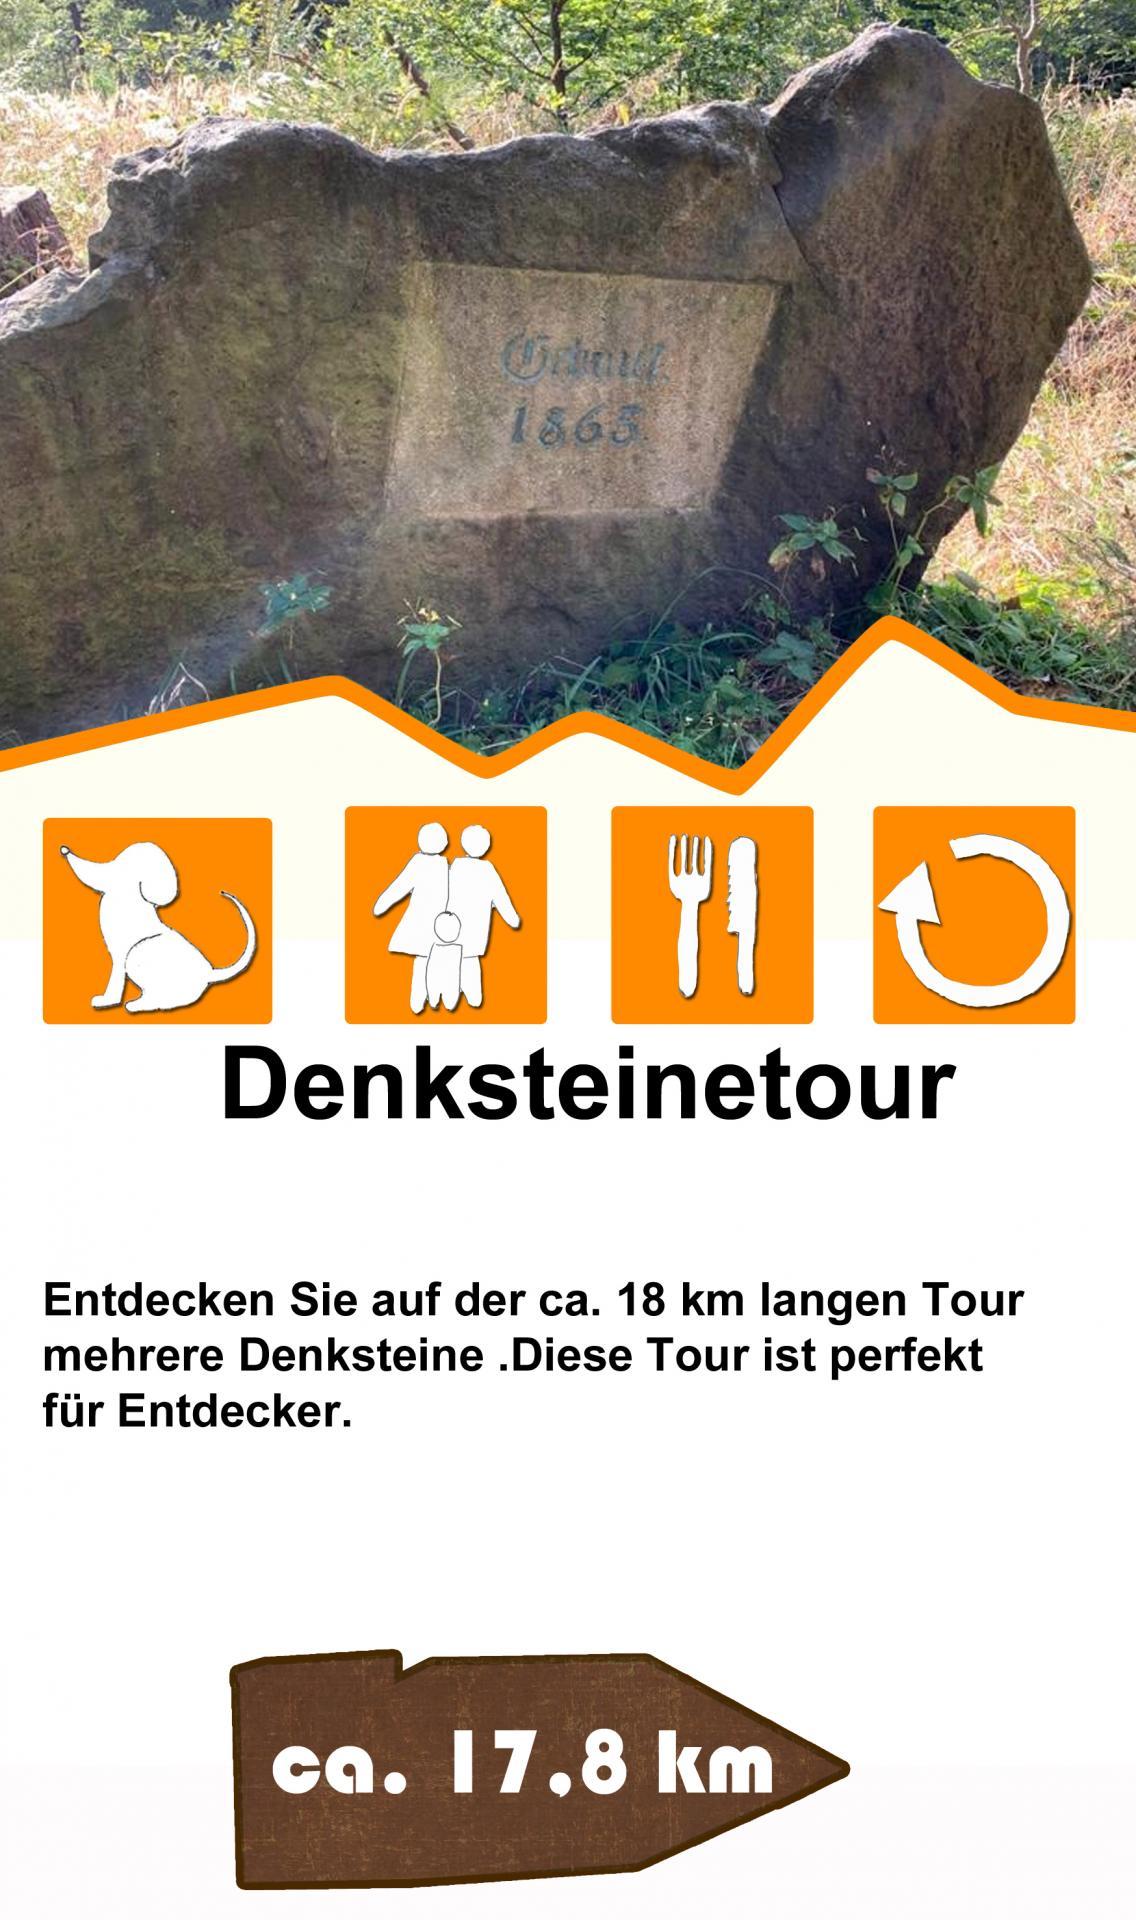 Denksteine-Tour